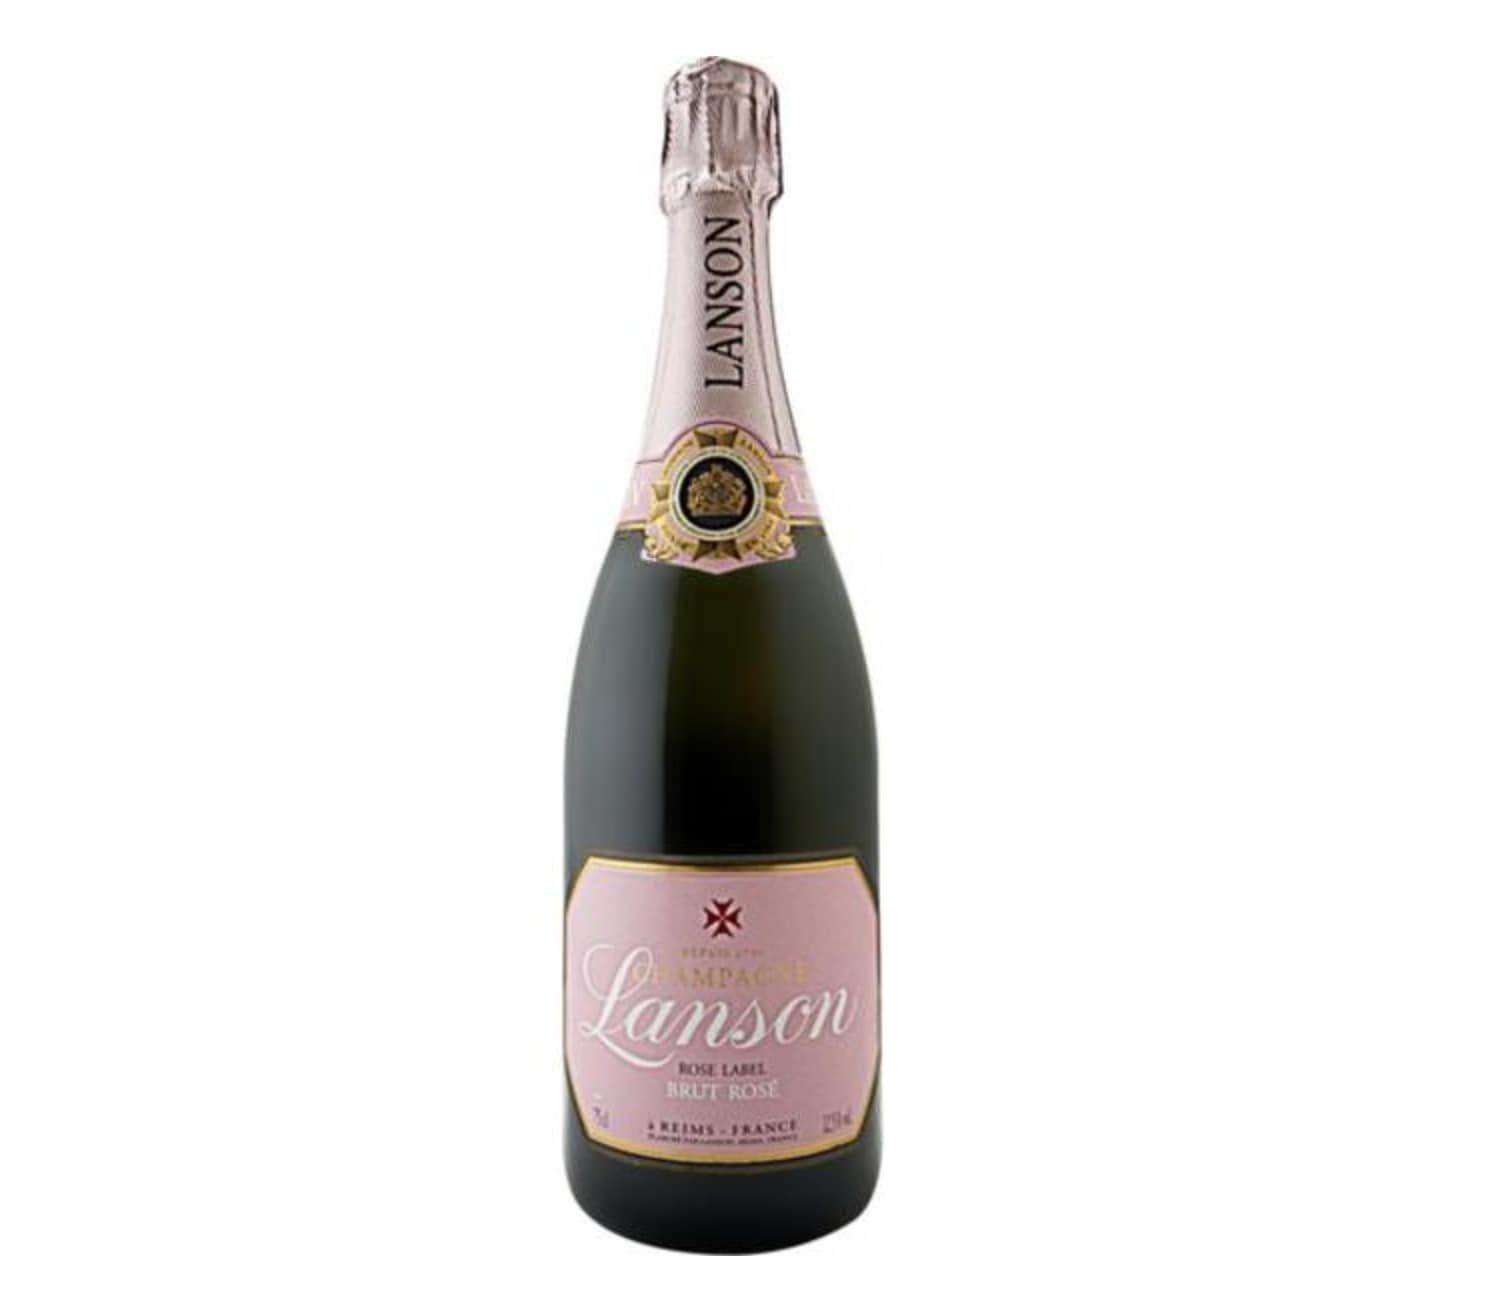 lanson-brut-rose-champagne